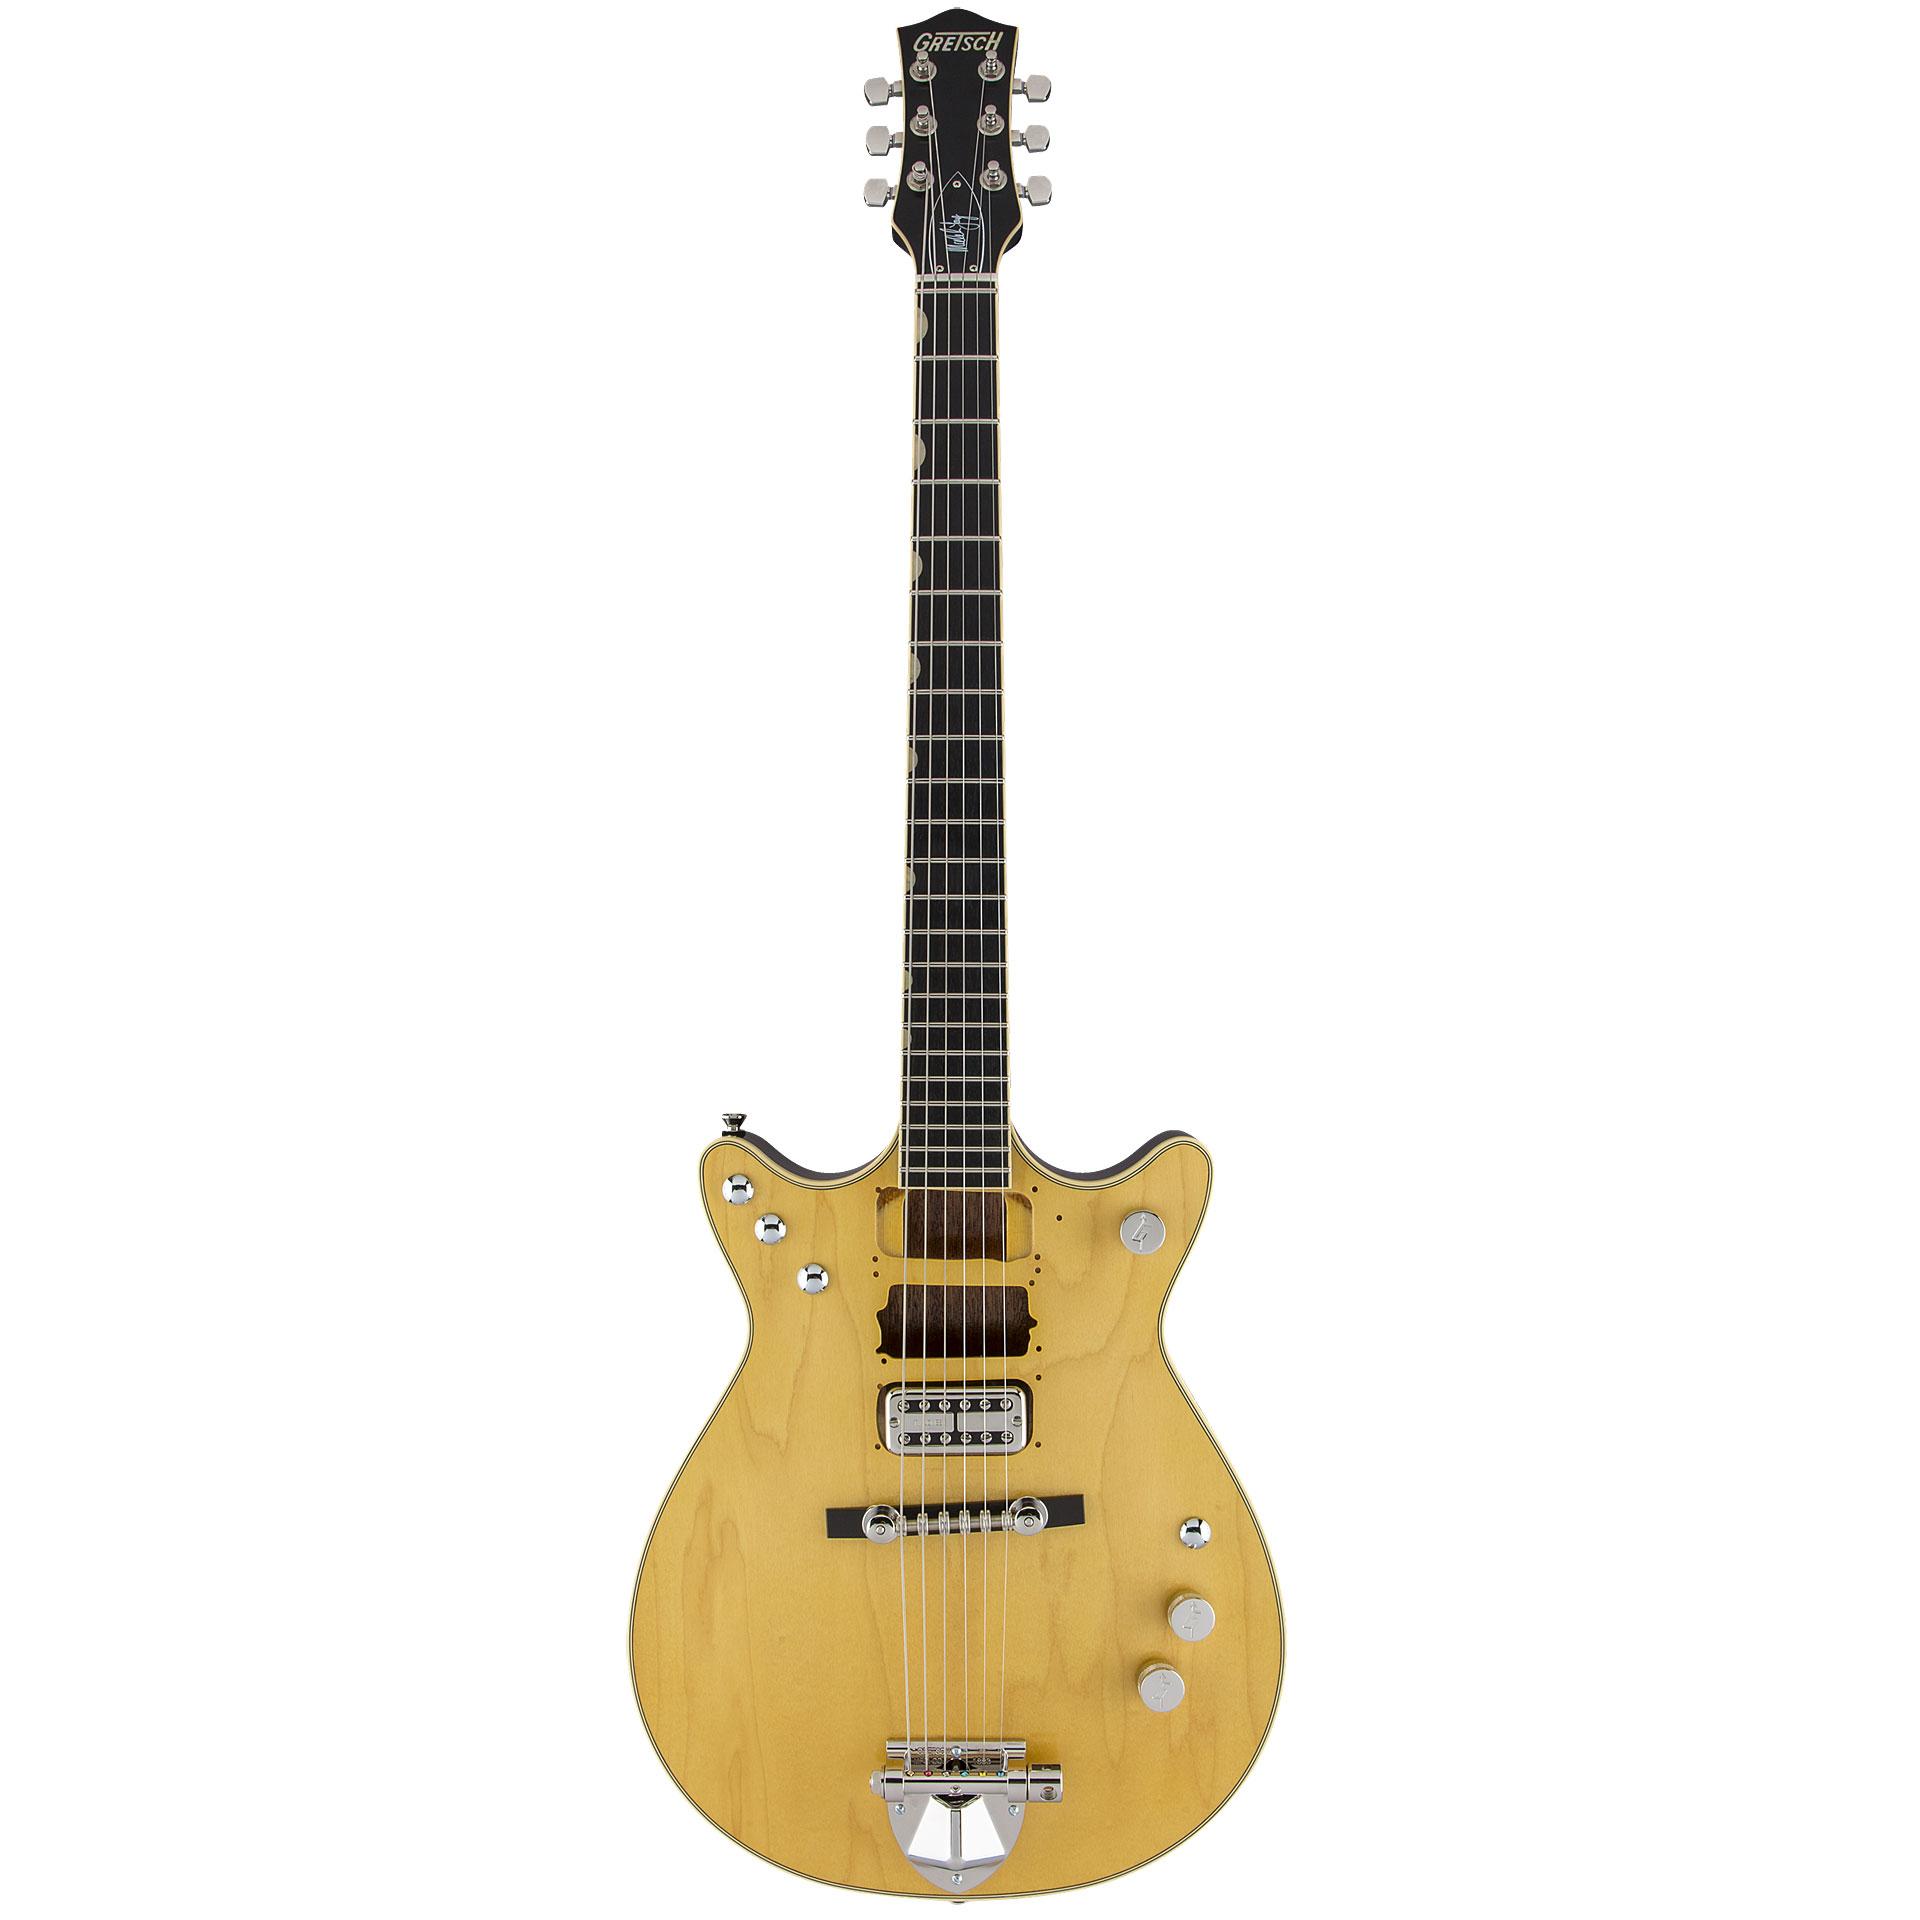 gretsch guitars g6131 my malcolm young signature e gitarre. Black Bedroom Furniture Sets. Home Design Ideas